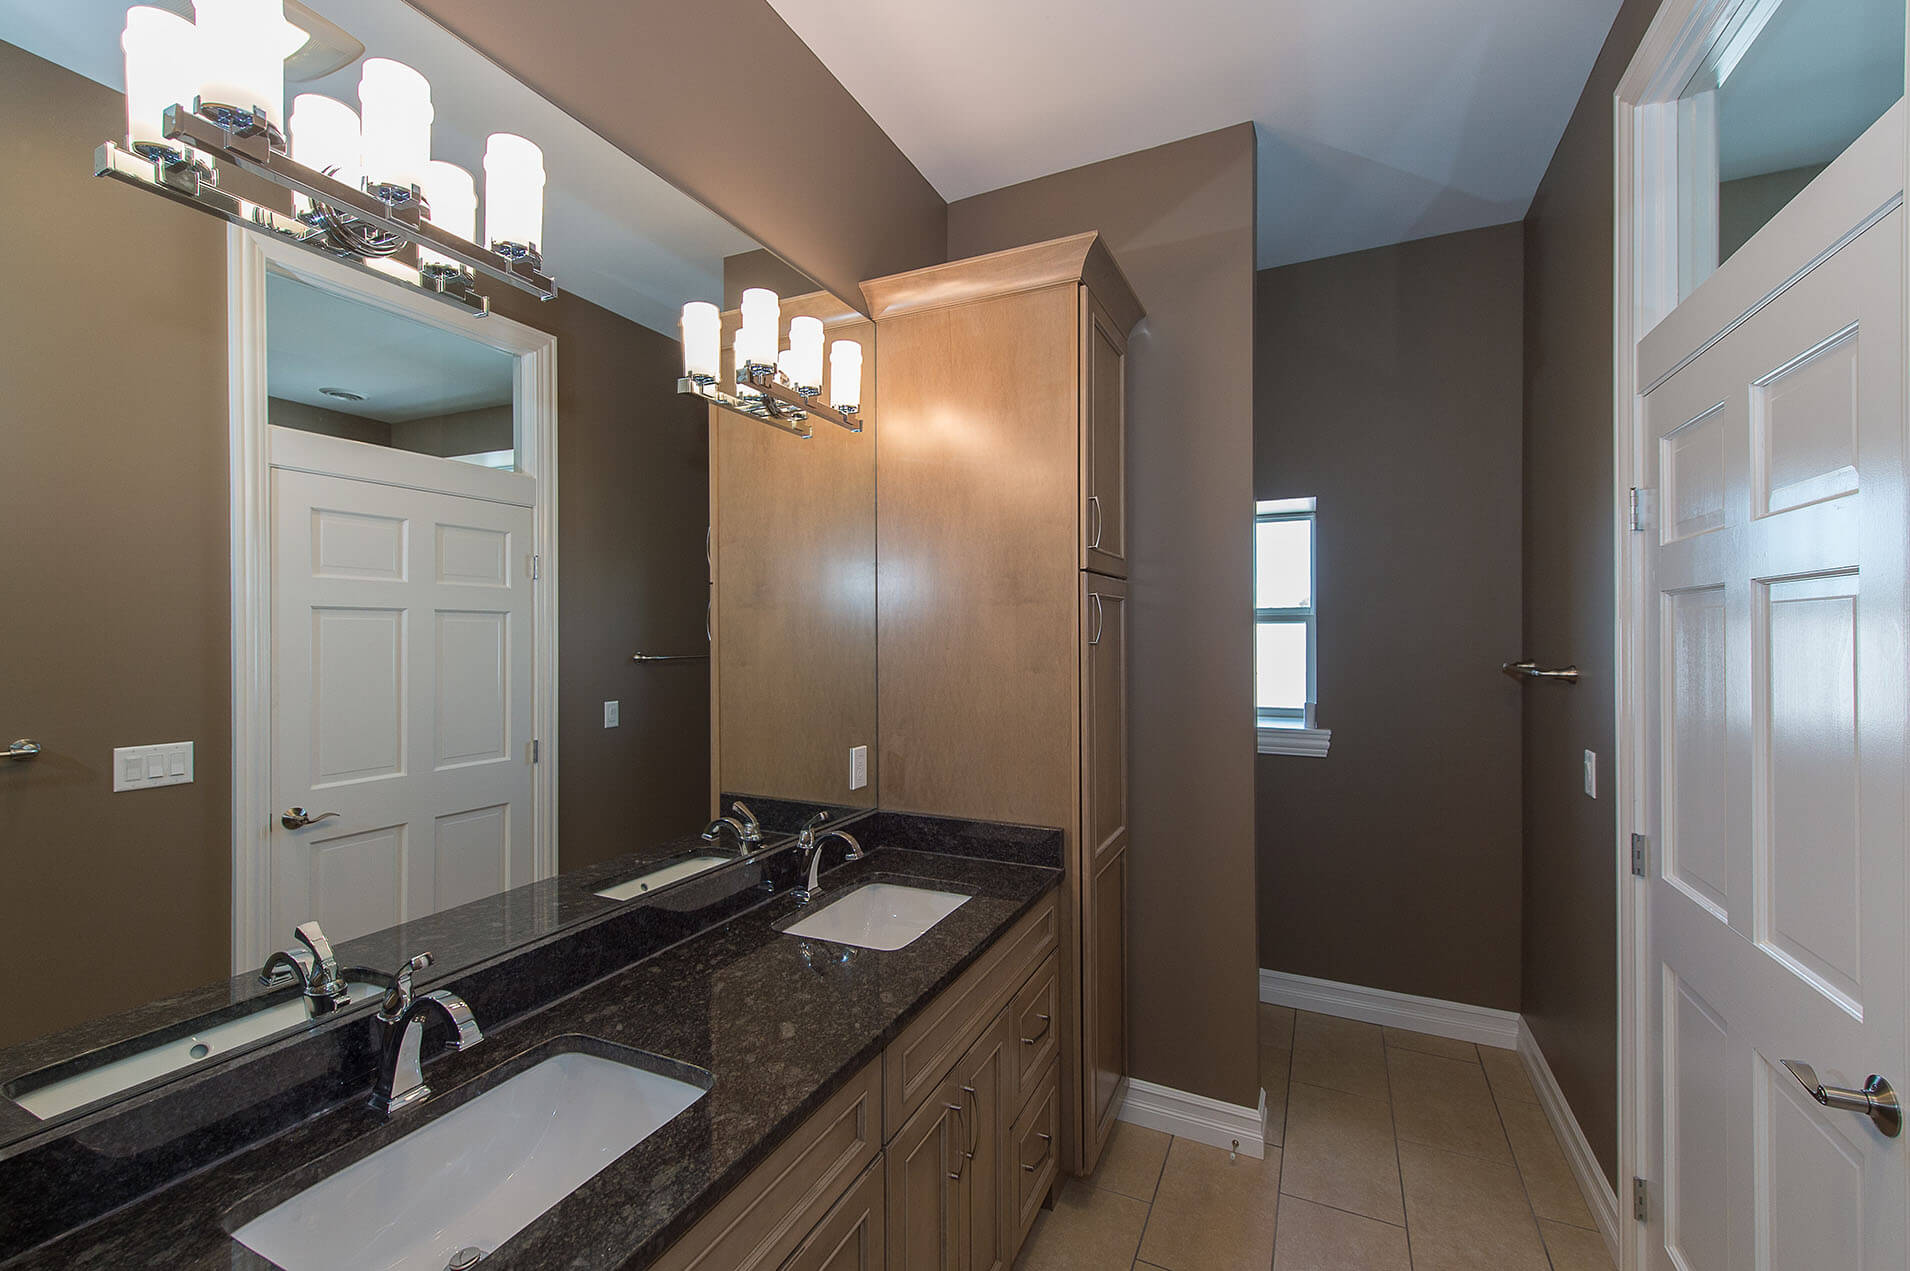 SSP_Midland_Apartment_071615-3